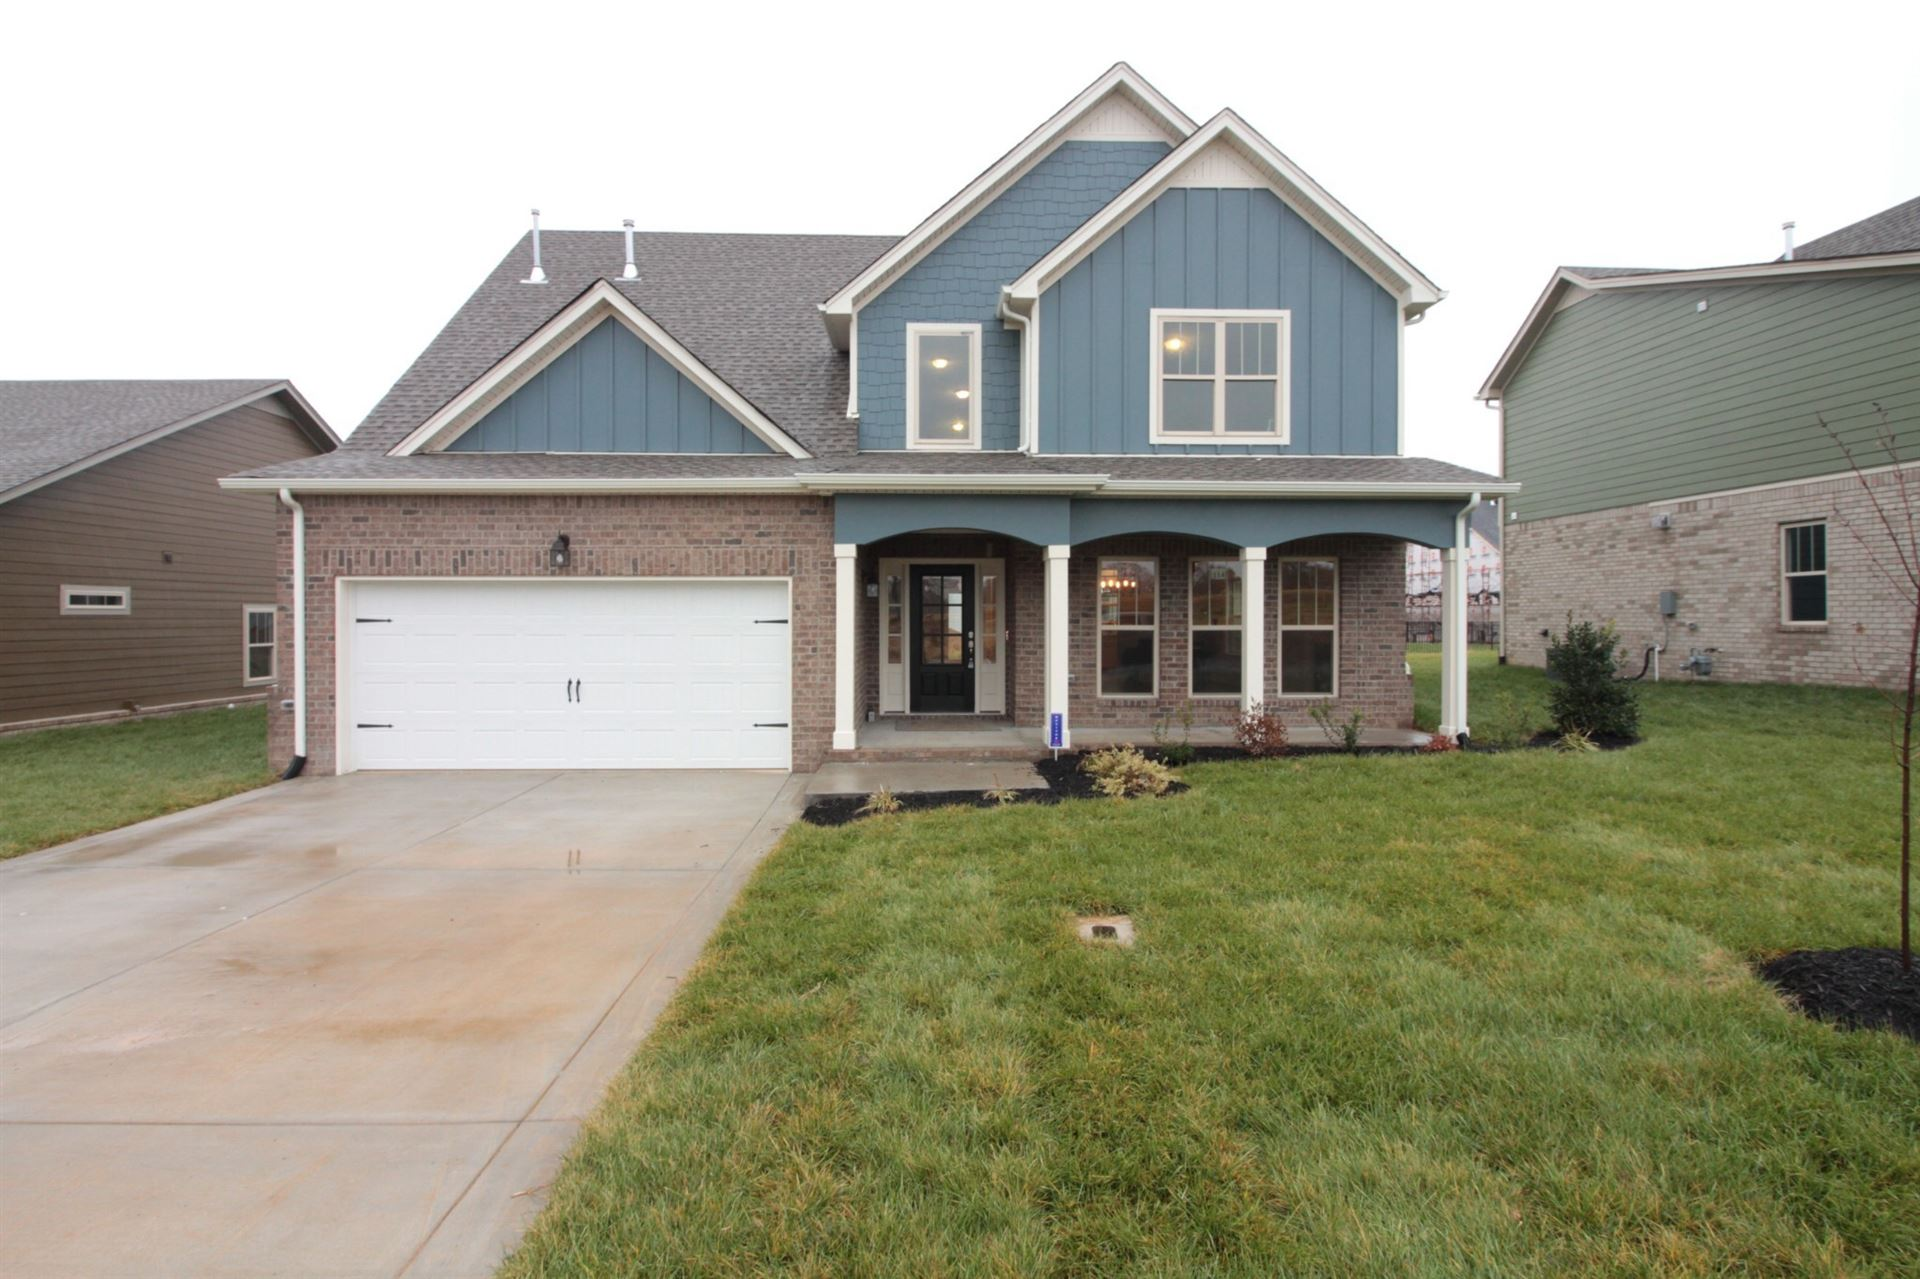 785 Jersey Dr Lot 114, Clarksville, TN 37043 - MLS#: 2169706